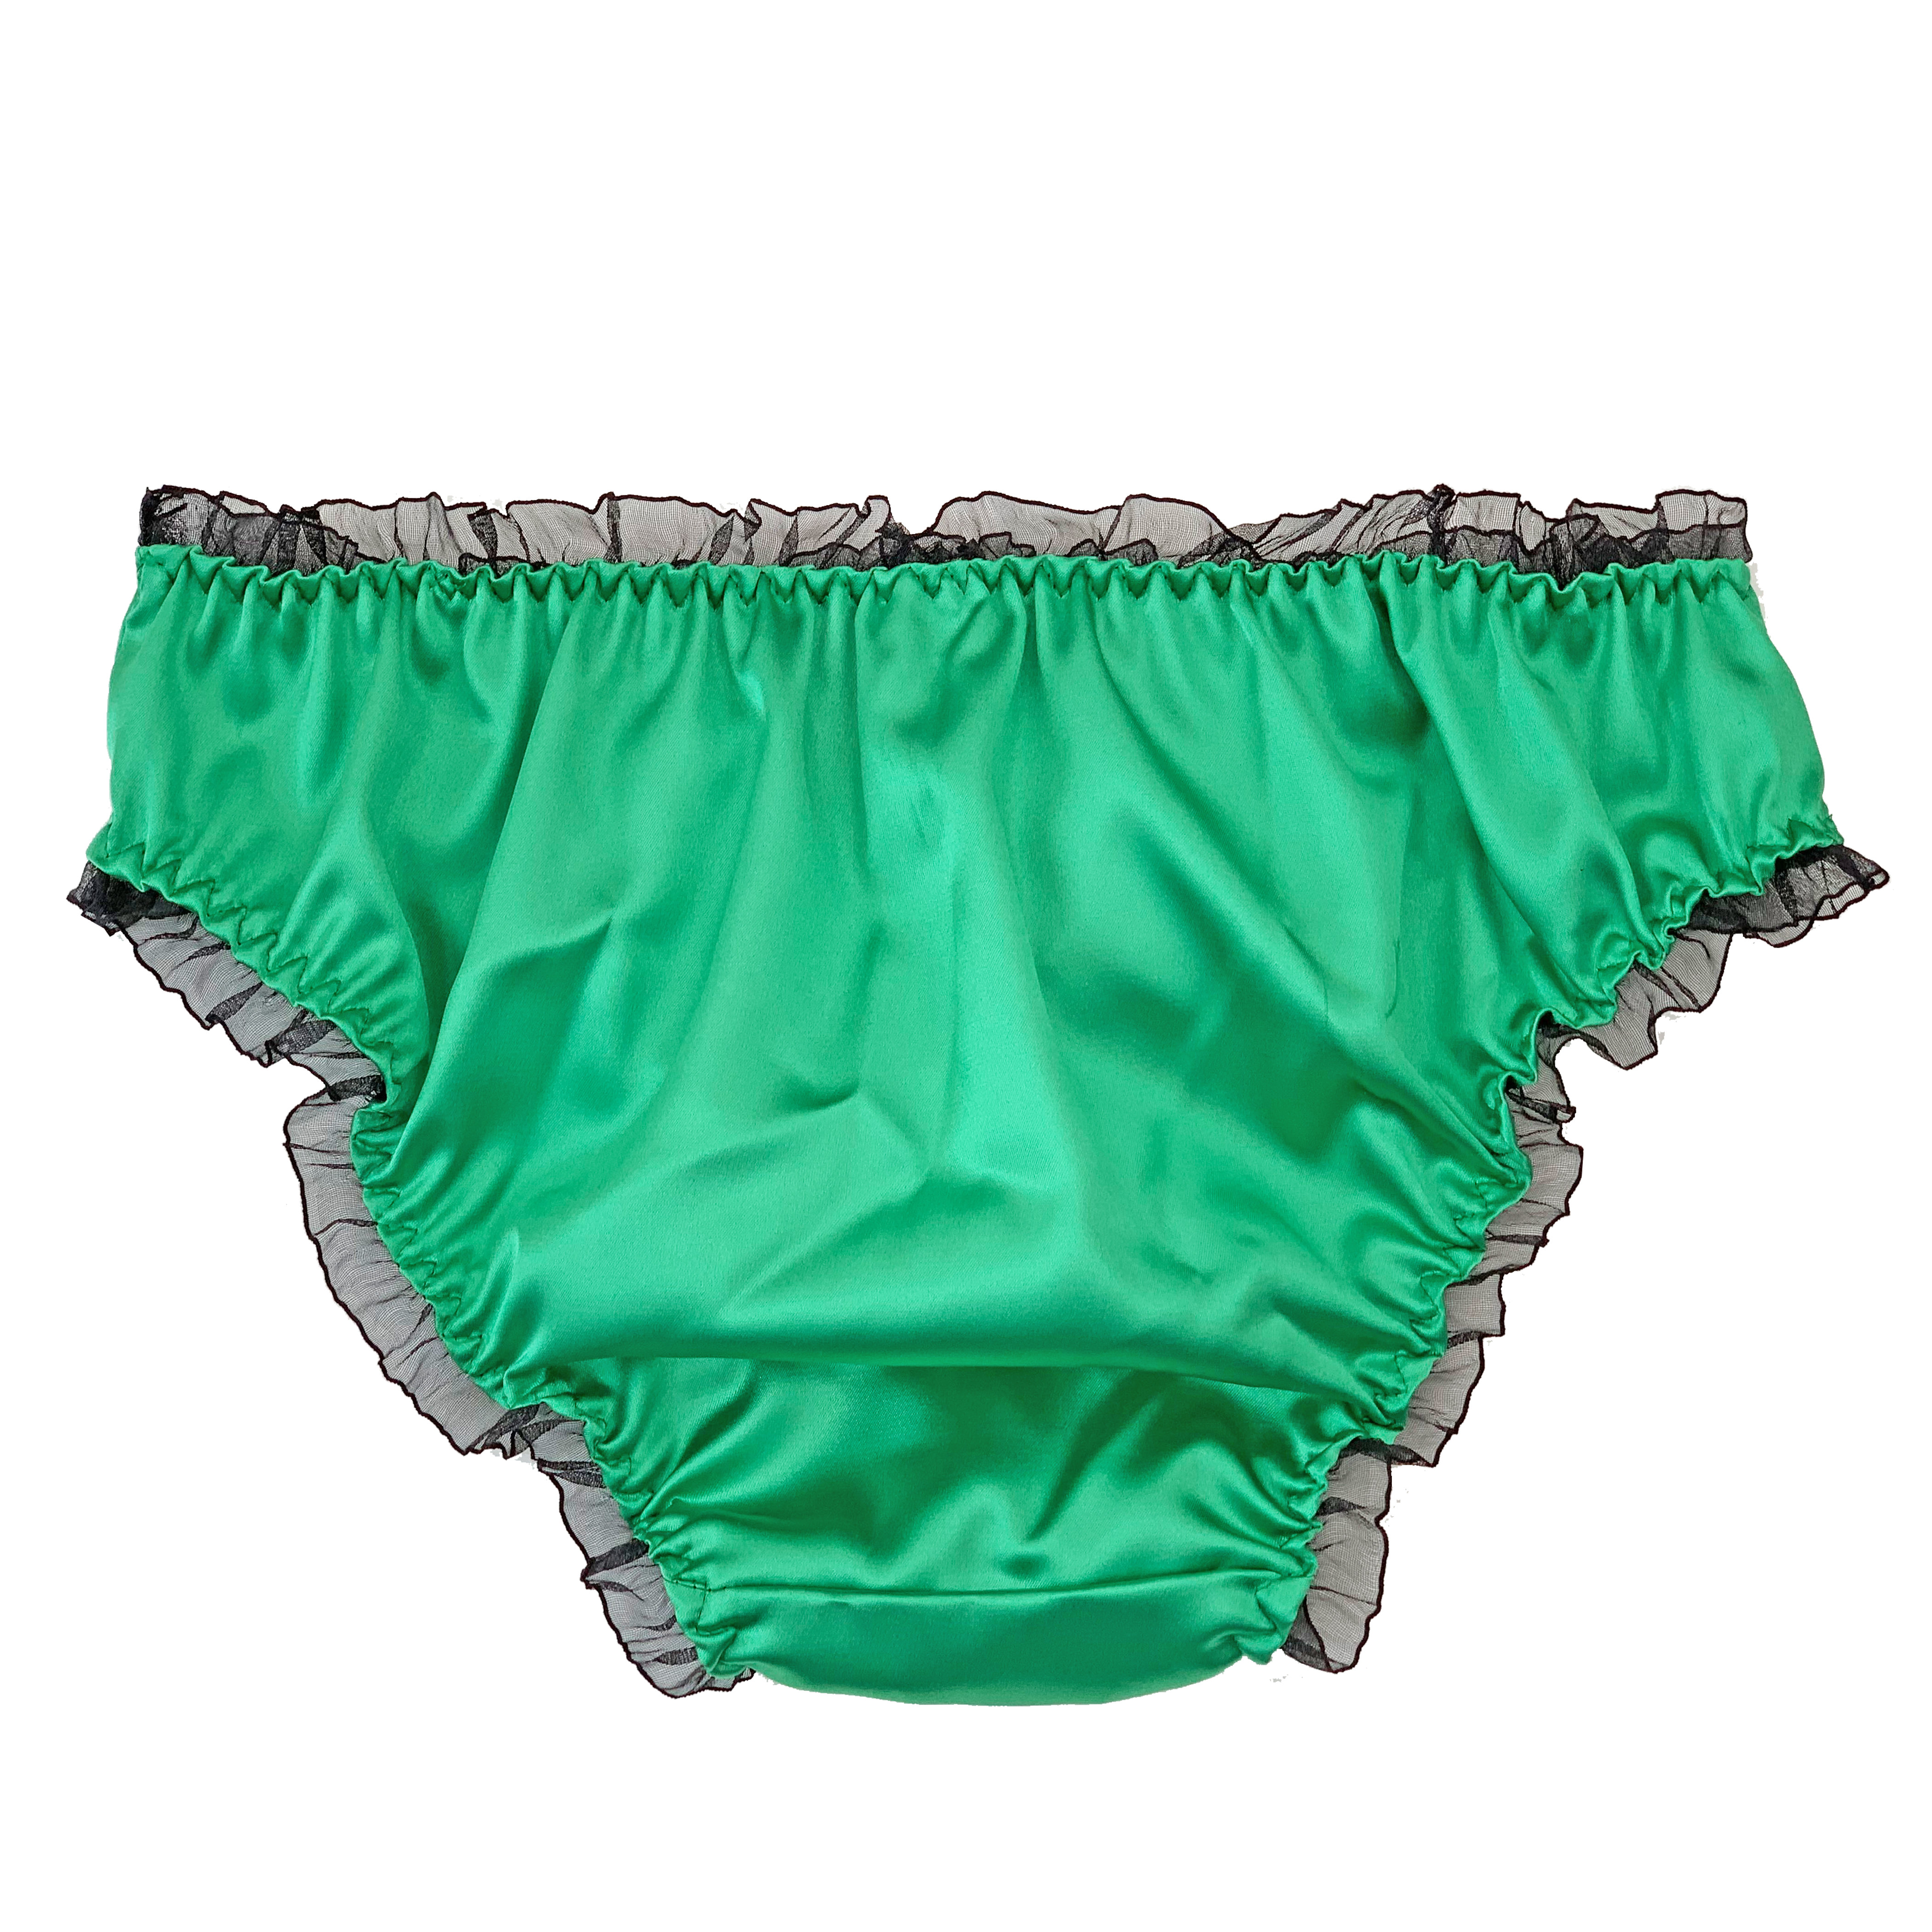 Teal Green Satin Frilly Sissy Panties Bikini Knicker Underwear Briefs Size 6-20